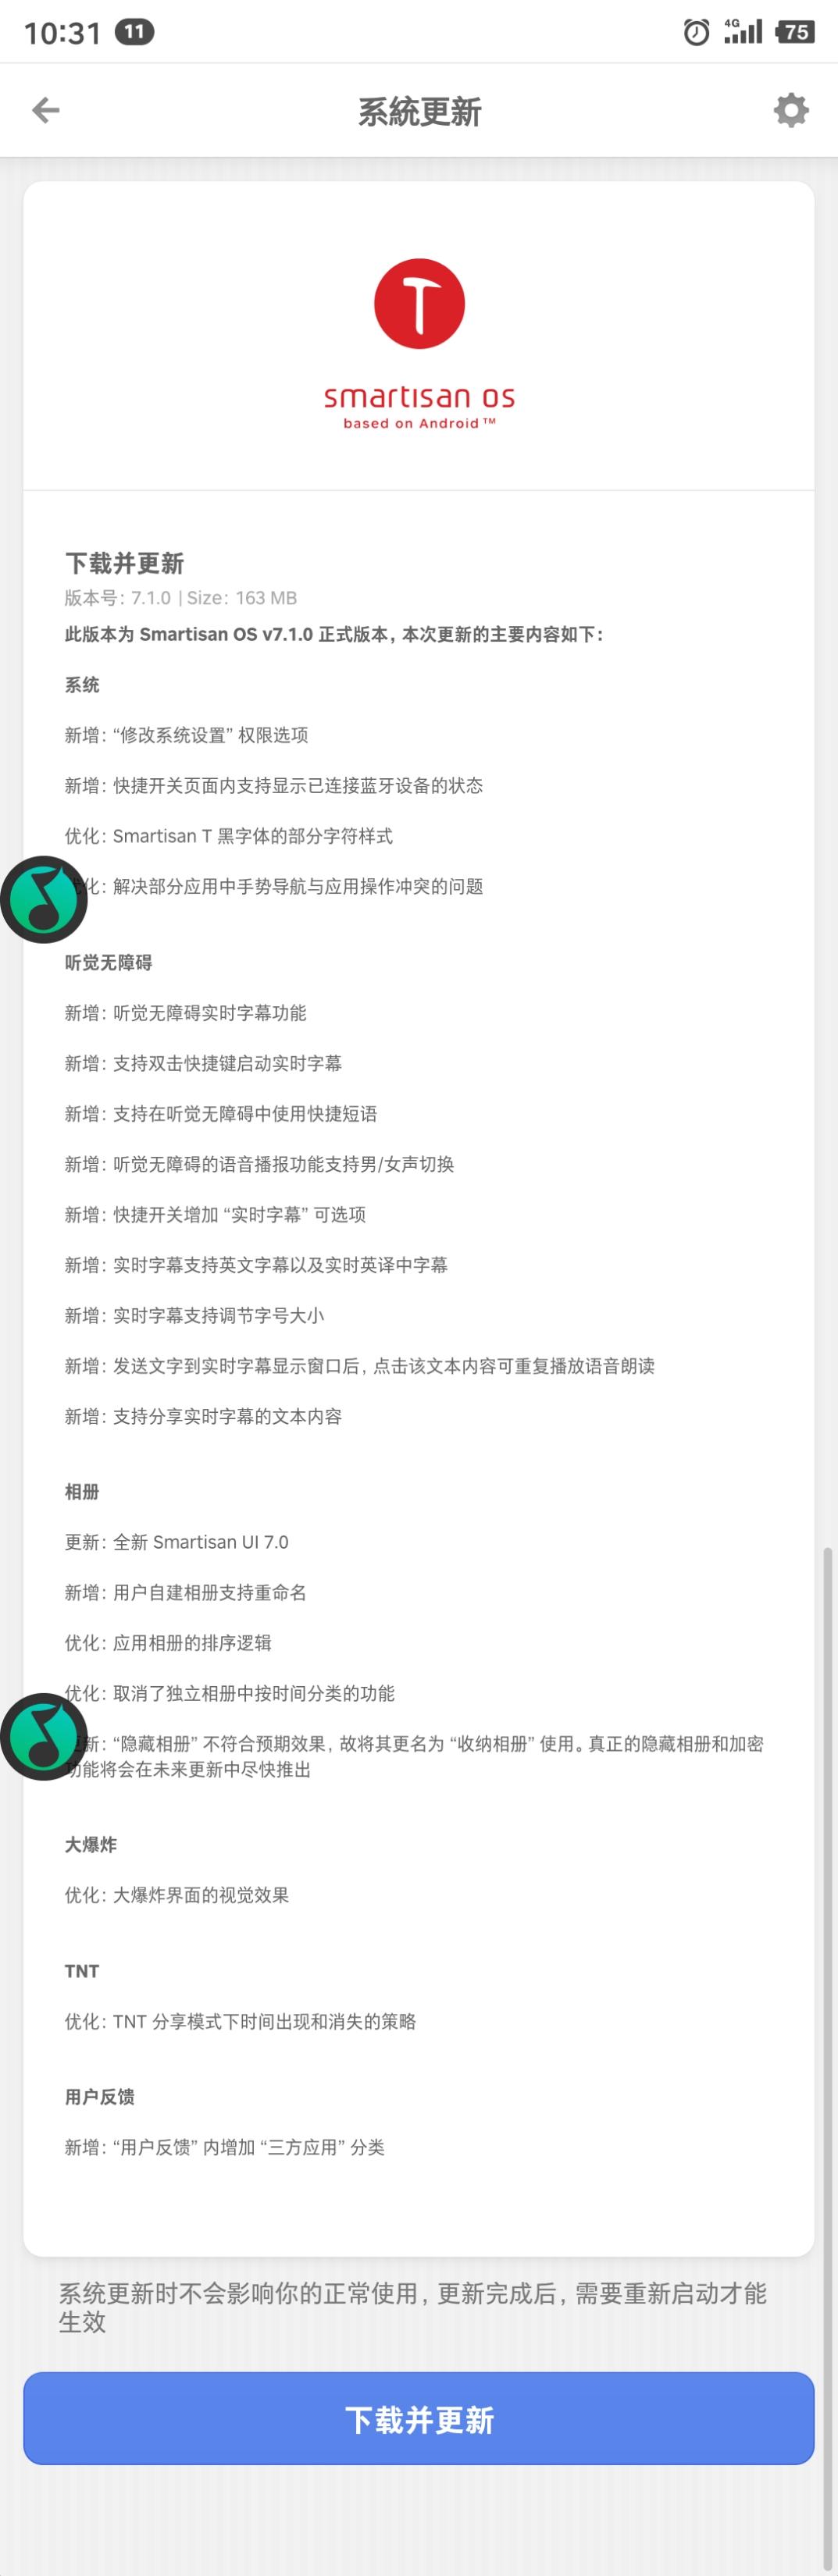 Screenshot_2020-05-22-10-31-12-517_????.png